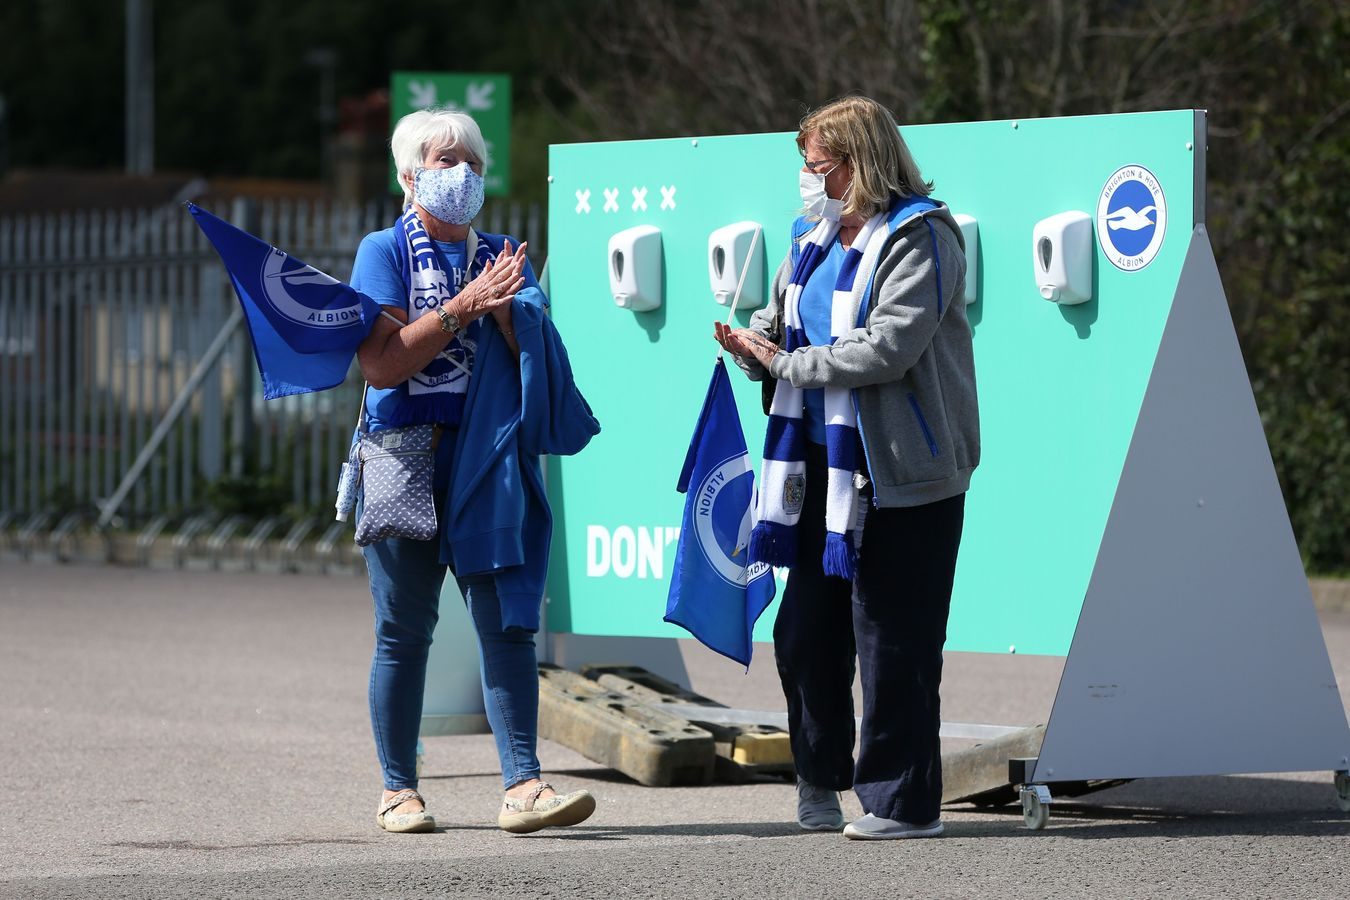 Brighton hand sanitisers